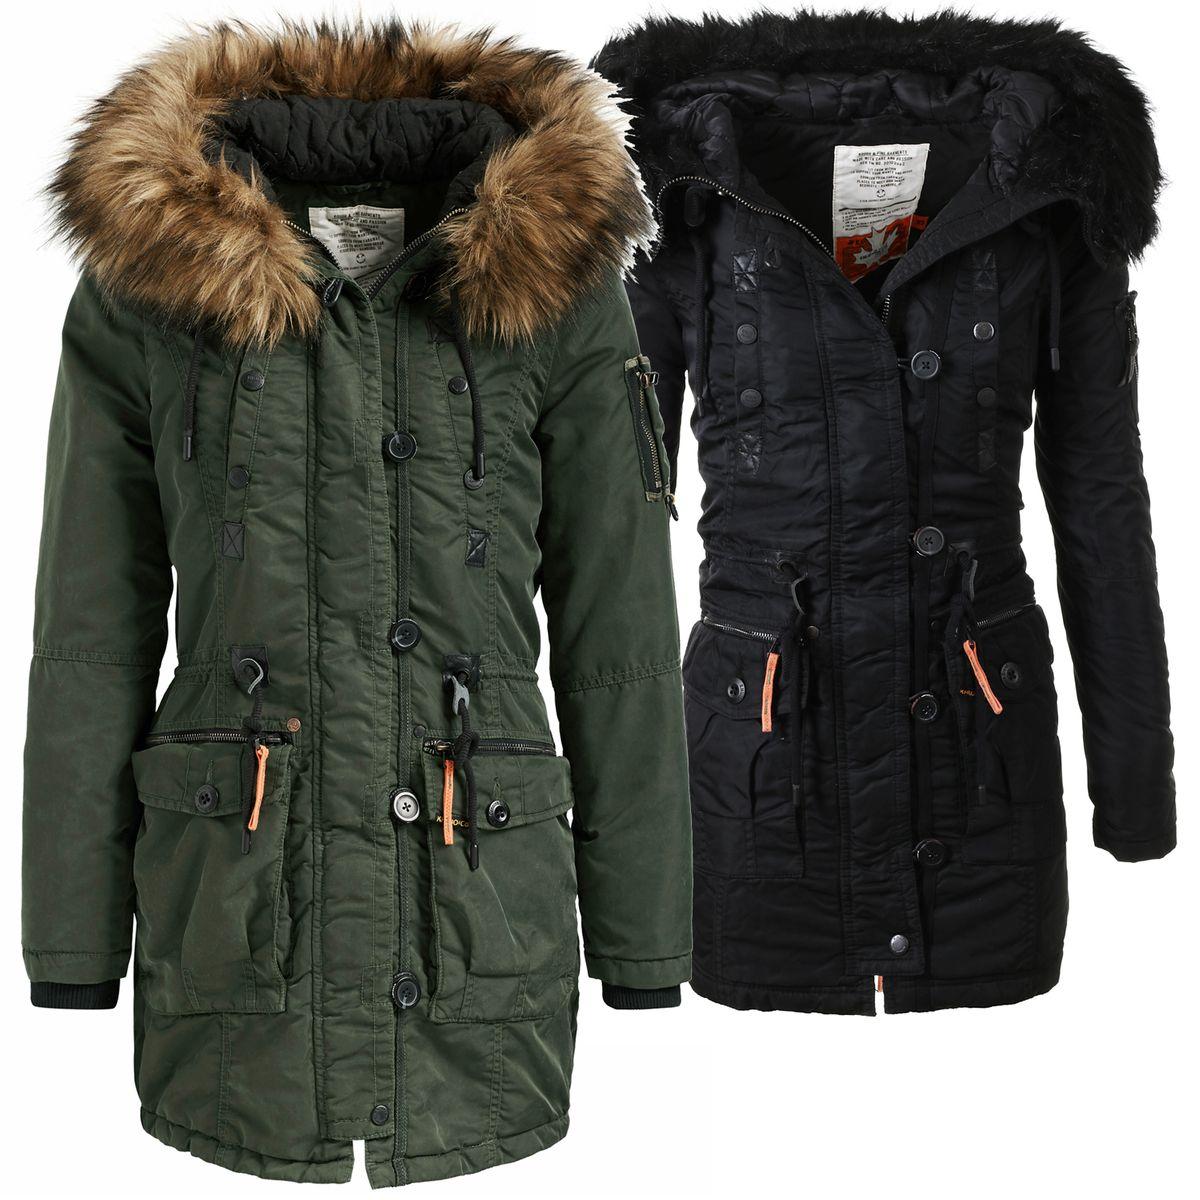 Parka Kapuze Damen 1584jk183 Gefüttert Mantel Details Mit Jacke Winter Khujo Zu Dhalia Warm 54A3RjL